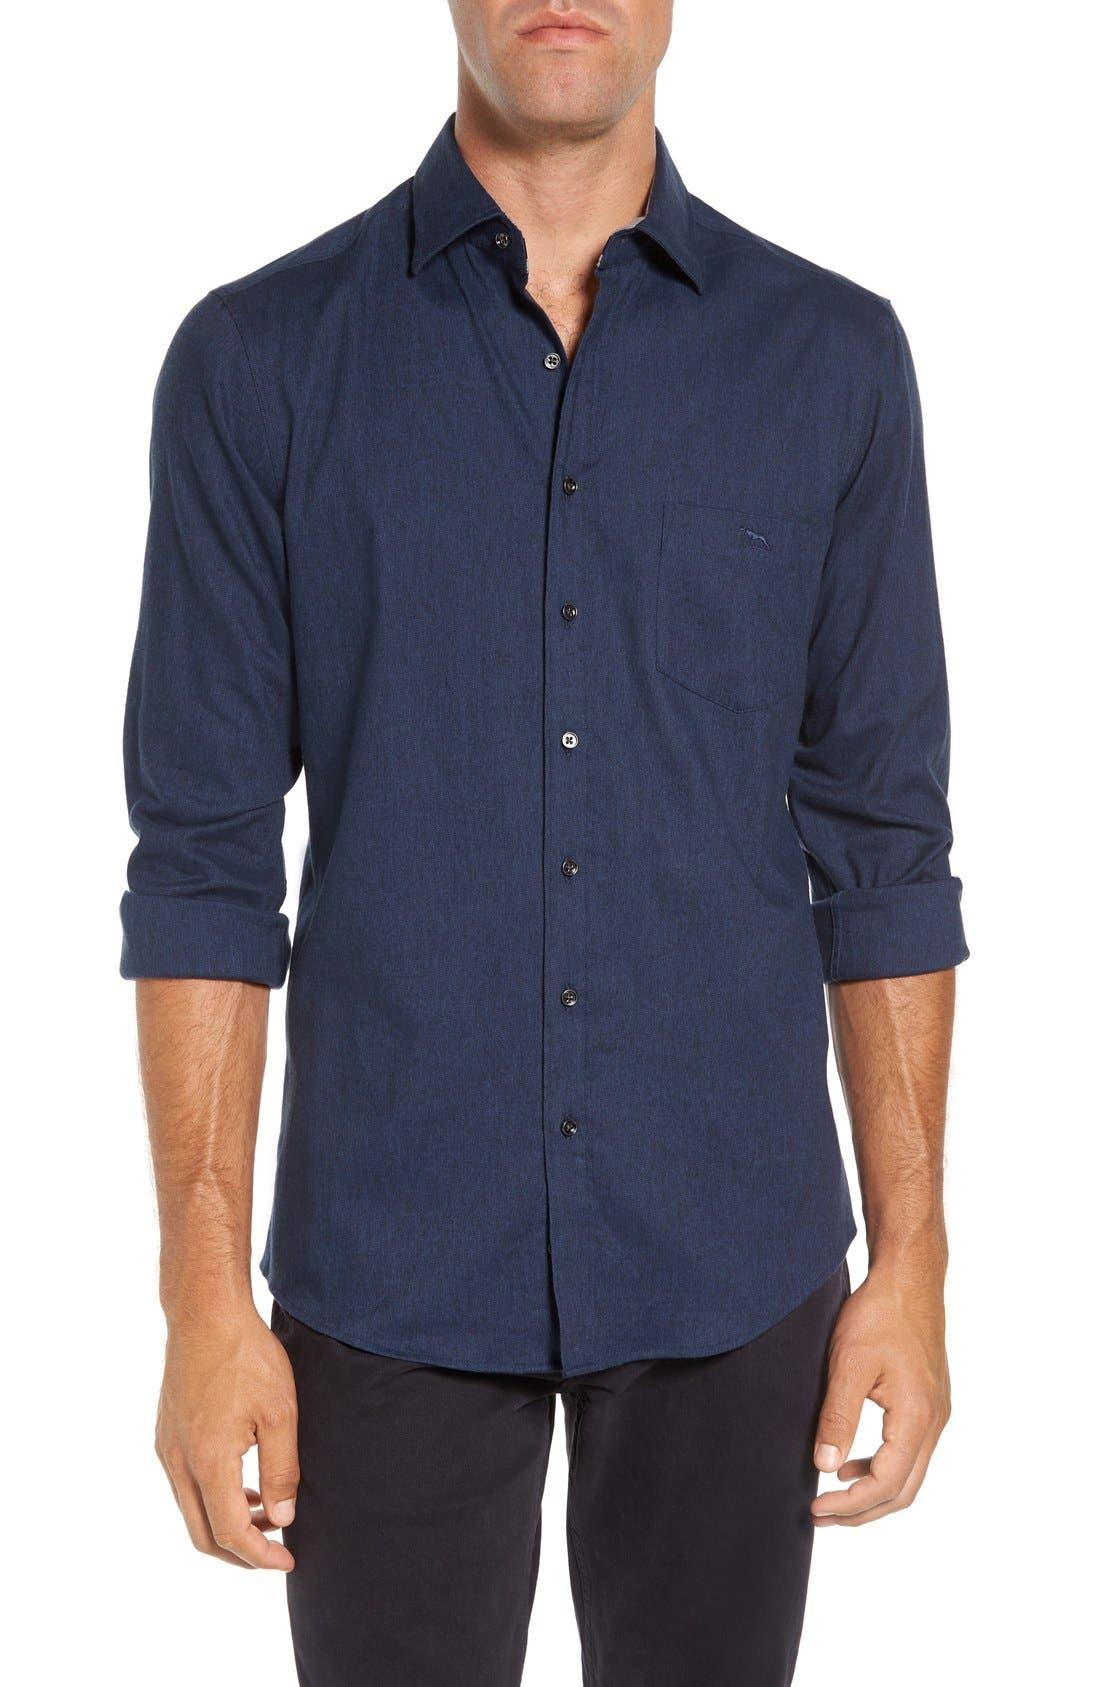 Main Image - Rodd & Gunn 'Sinclair' Trim Fit Brushed Twill Sport Shirt